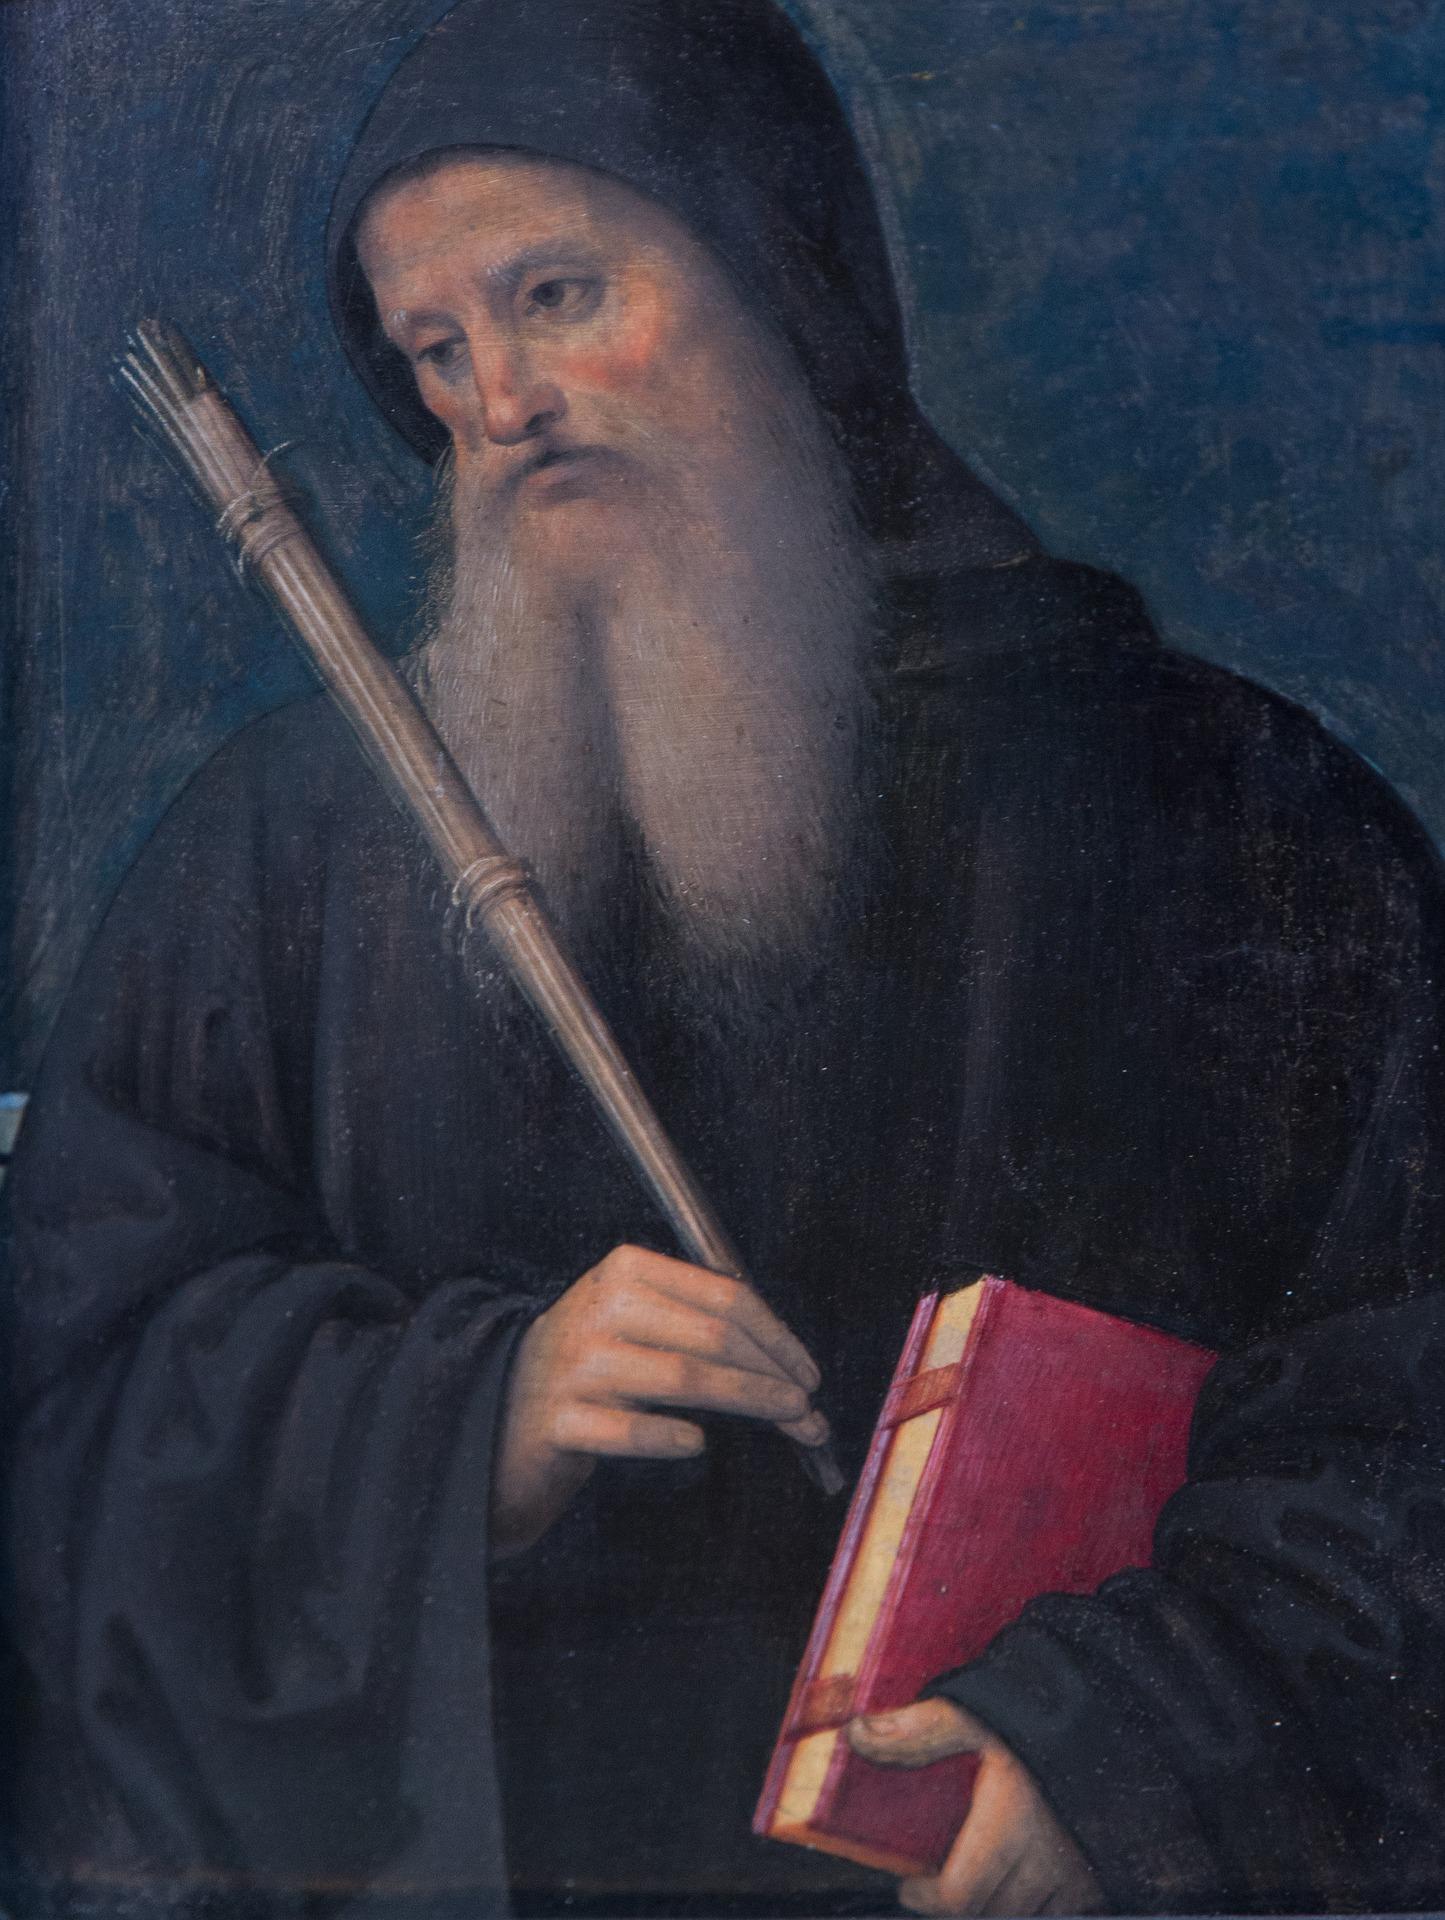 saint-benedict-1508869_1920.jpg